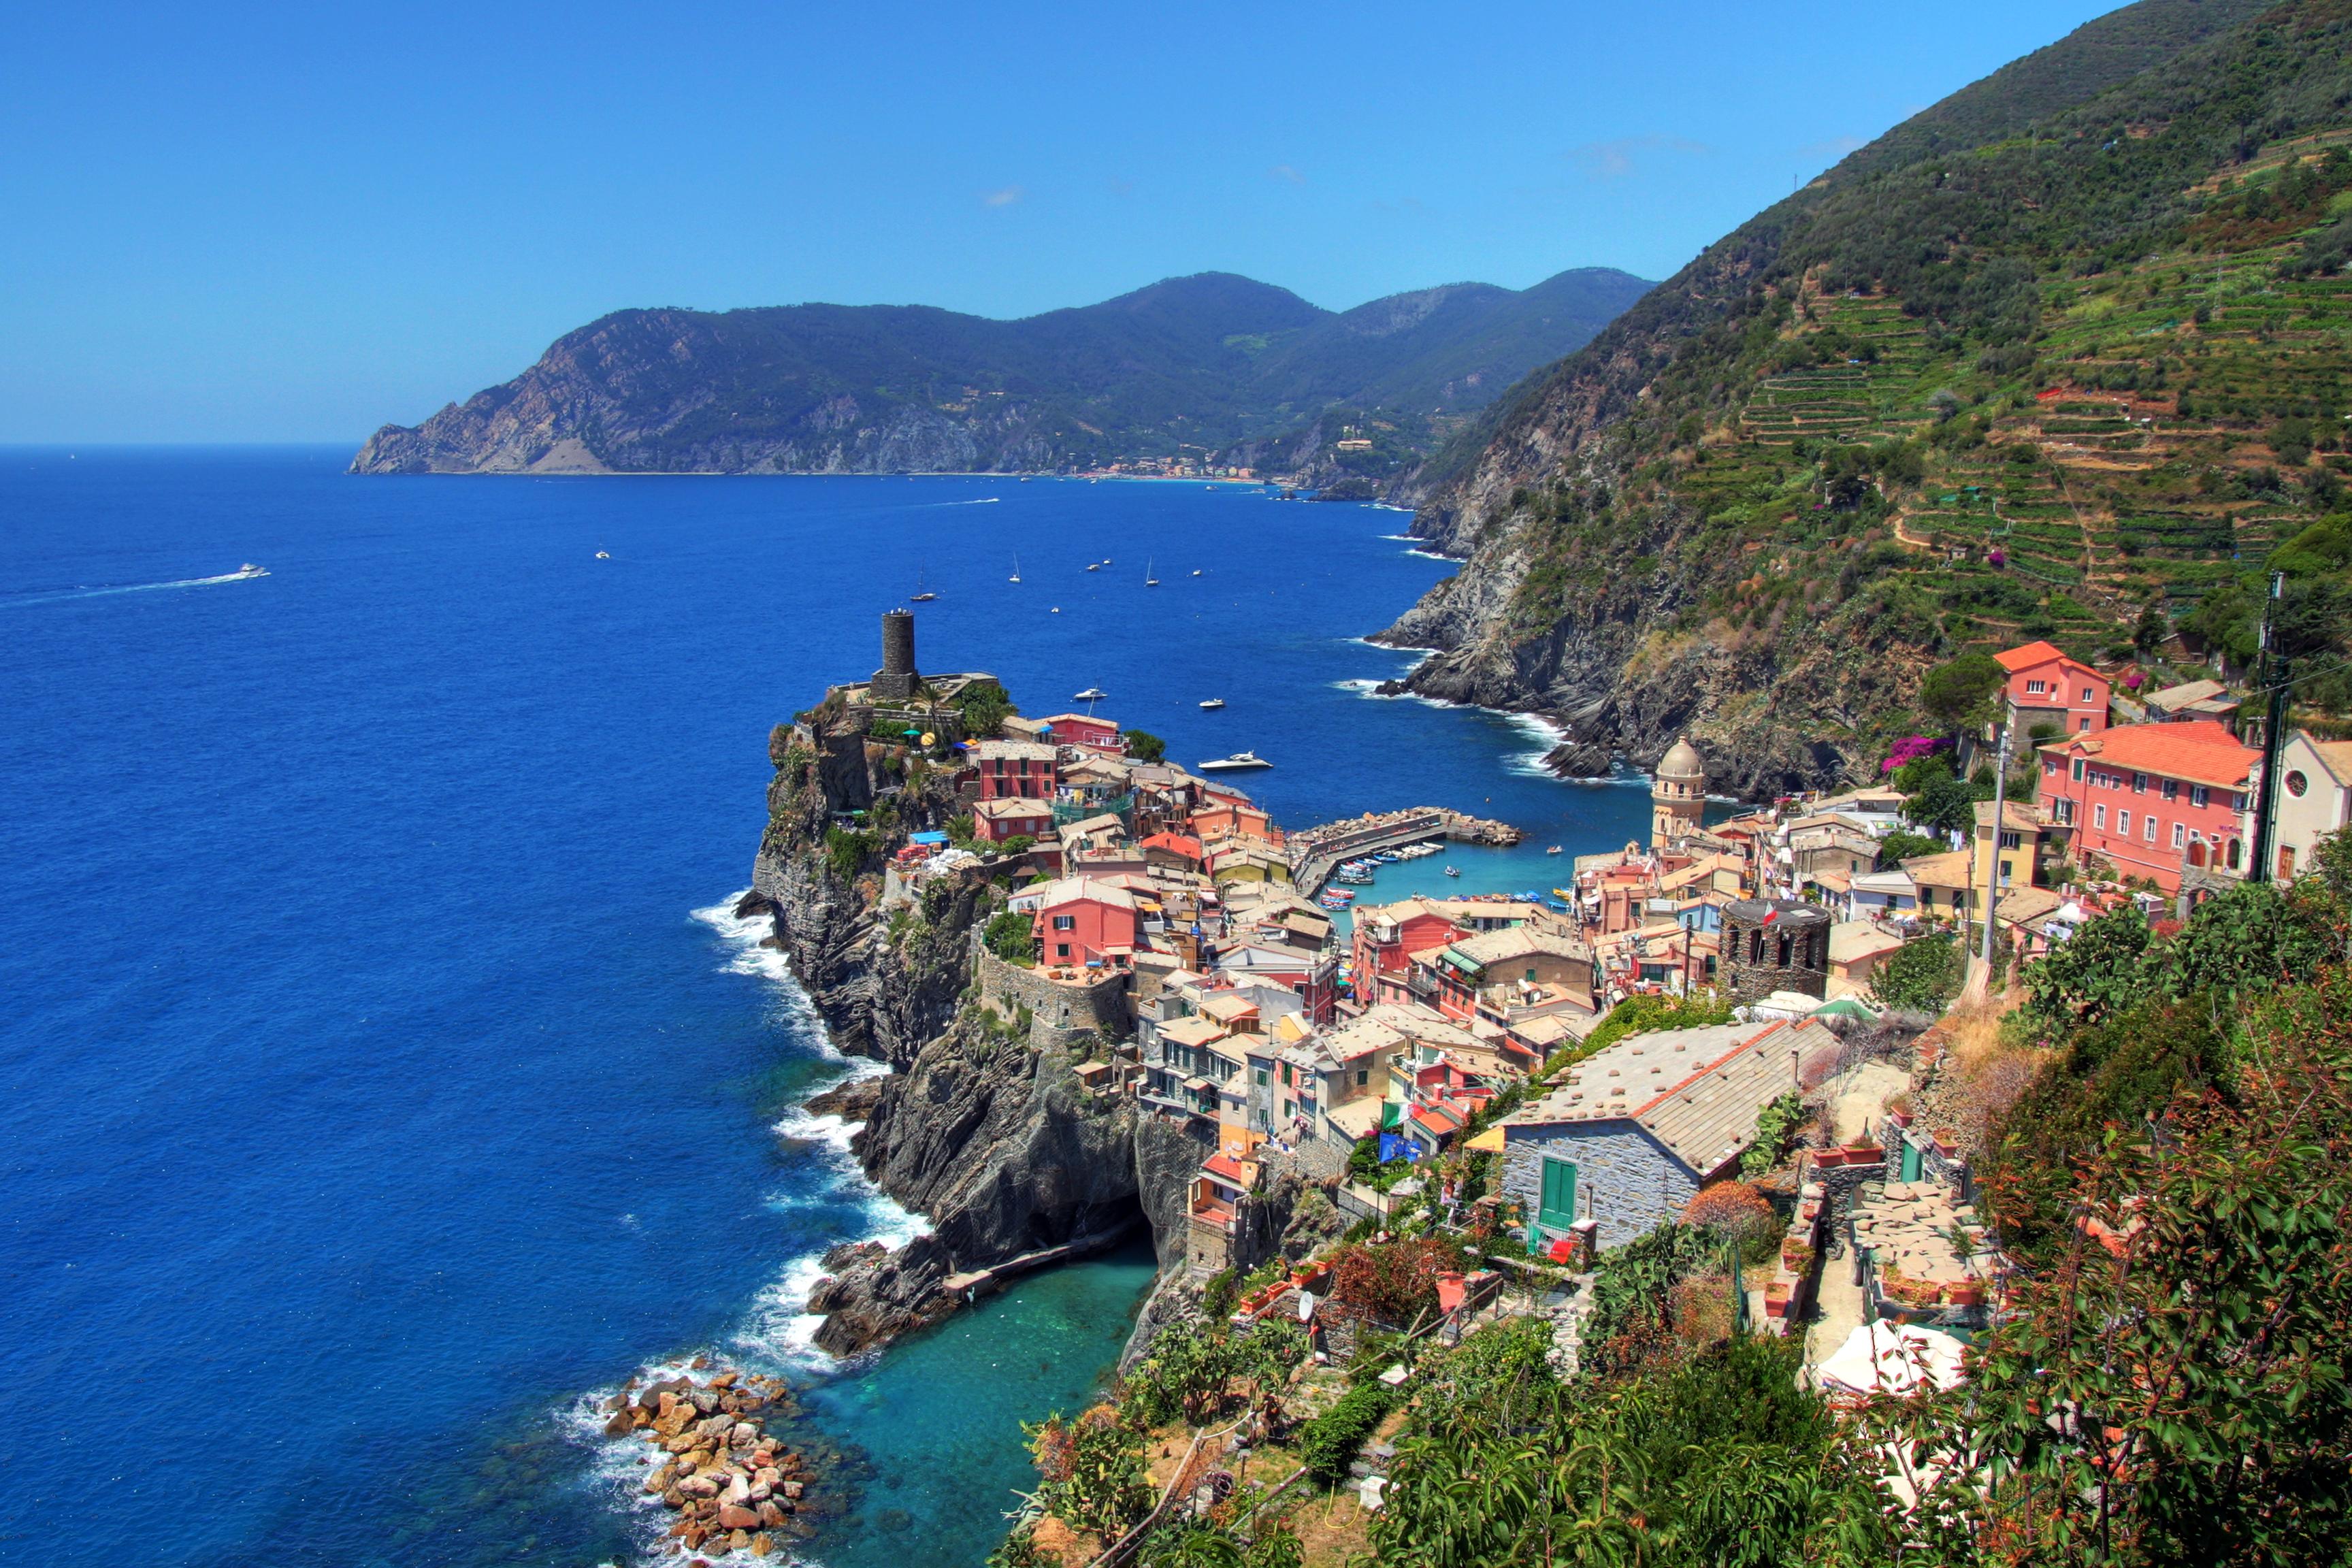 италия, море, горы